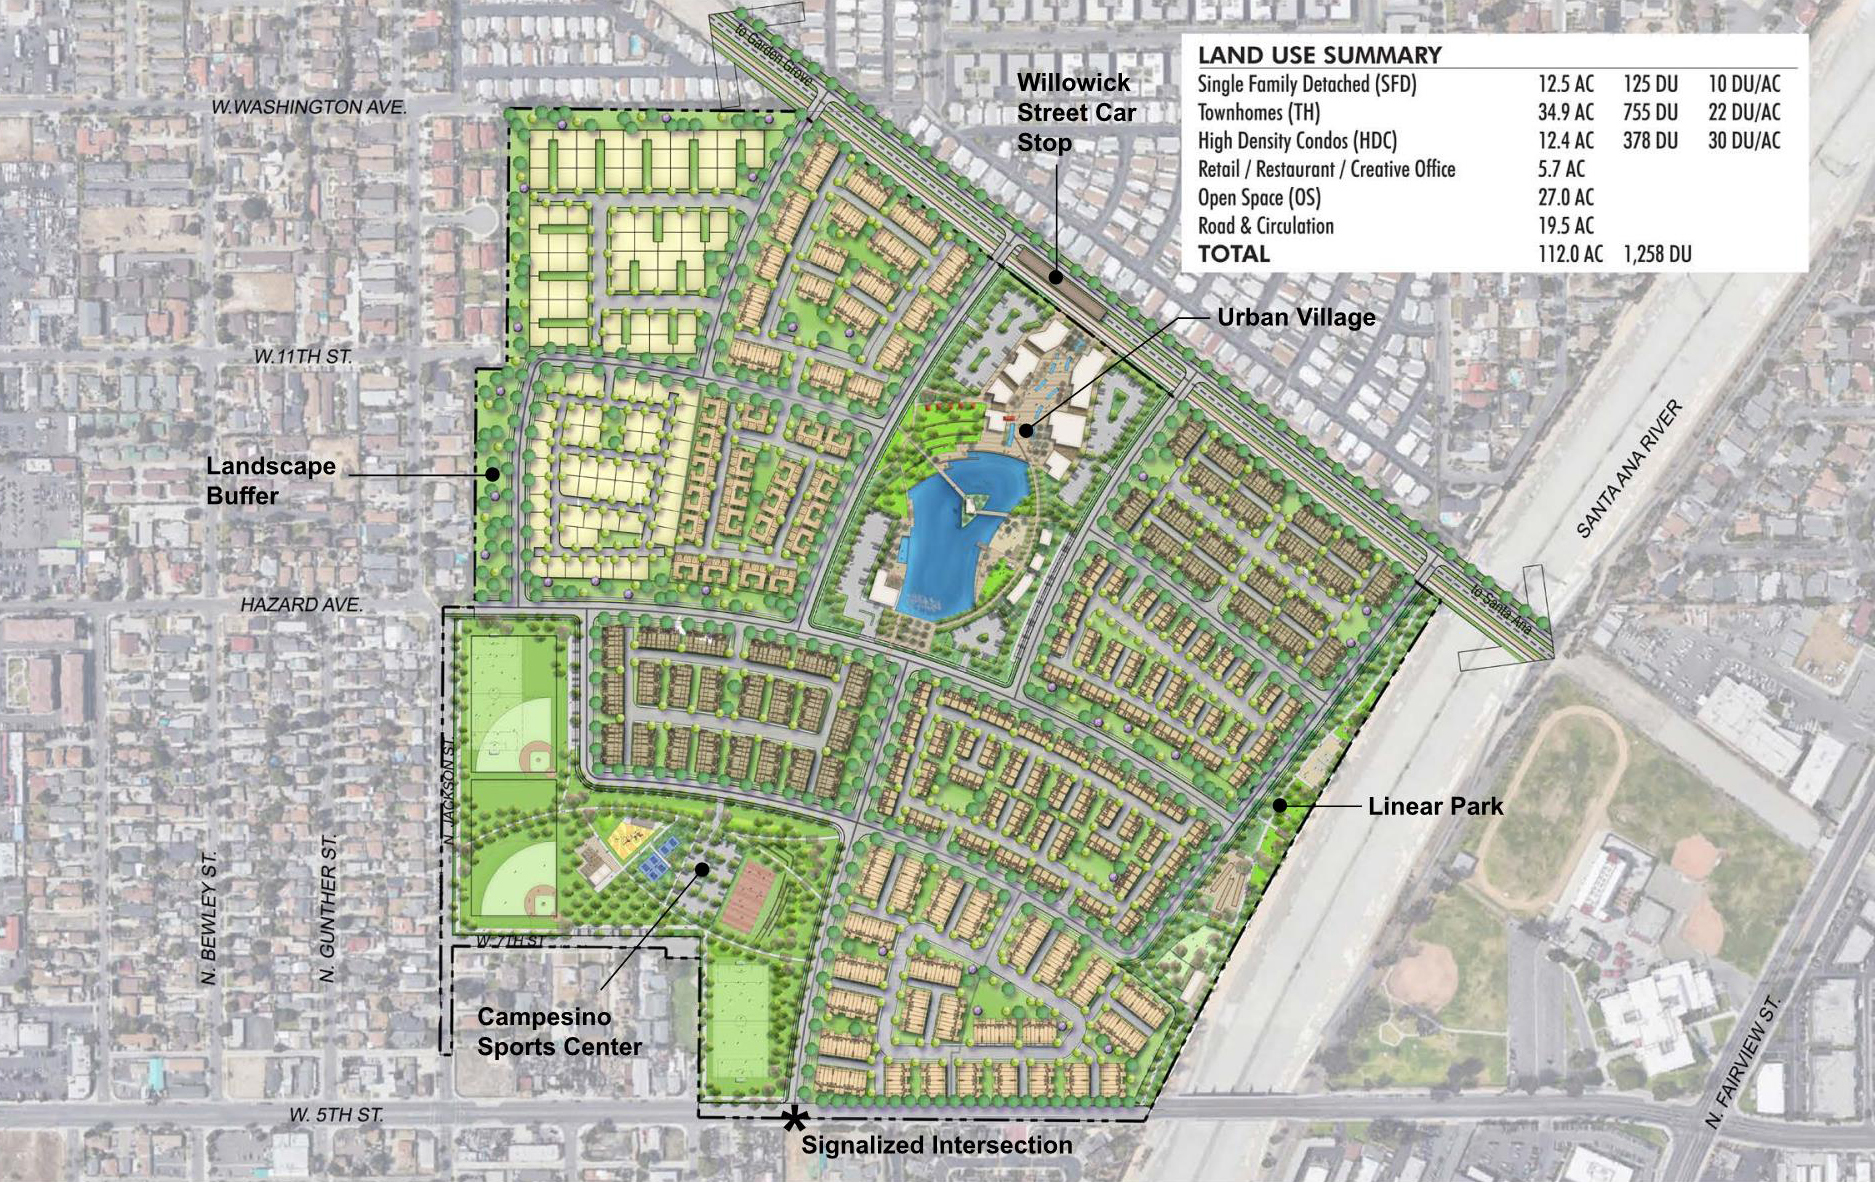 Willowick Land Use Plan